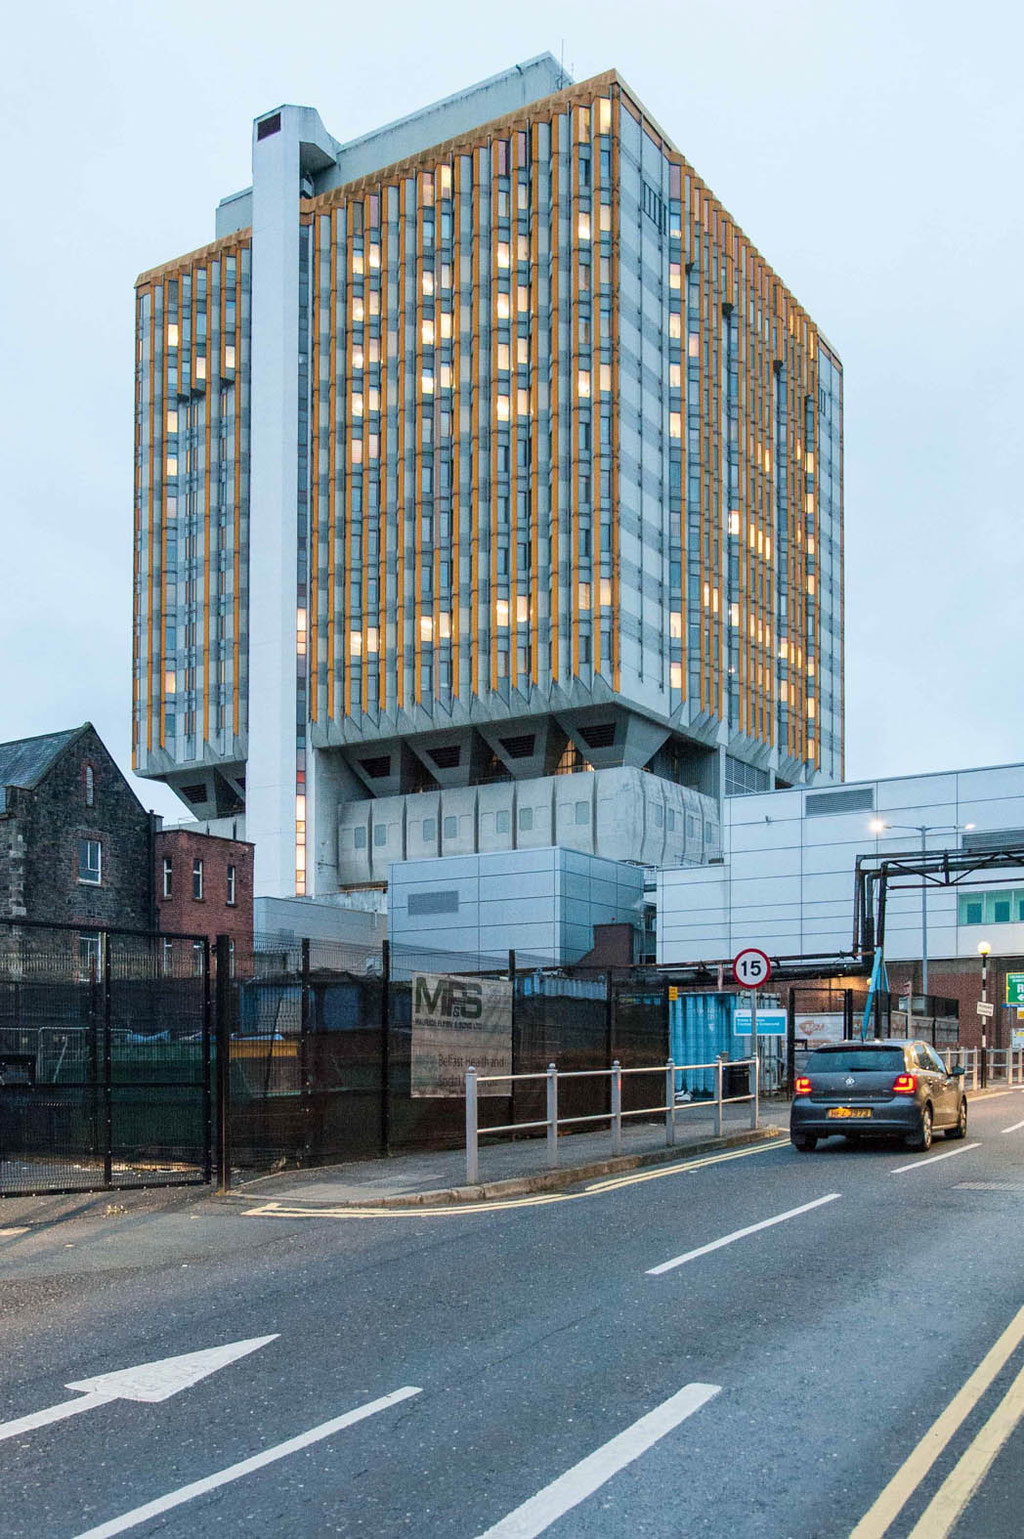 Belfast City Hospital (Louis Adair Roche), Belfast (NI)